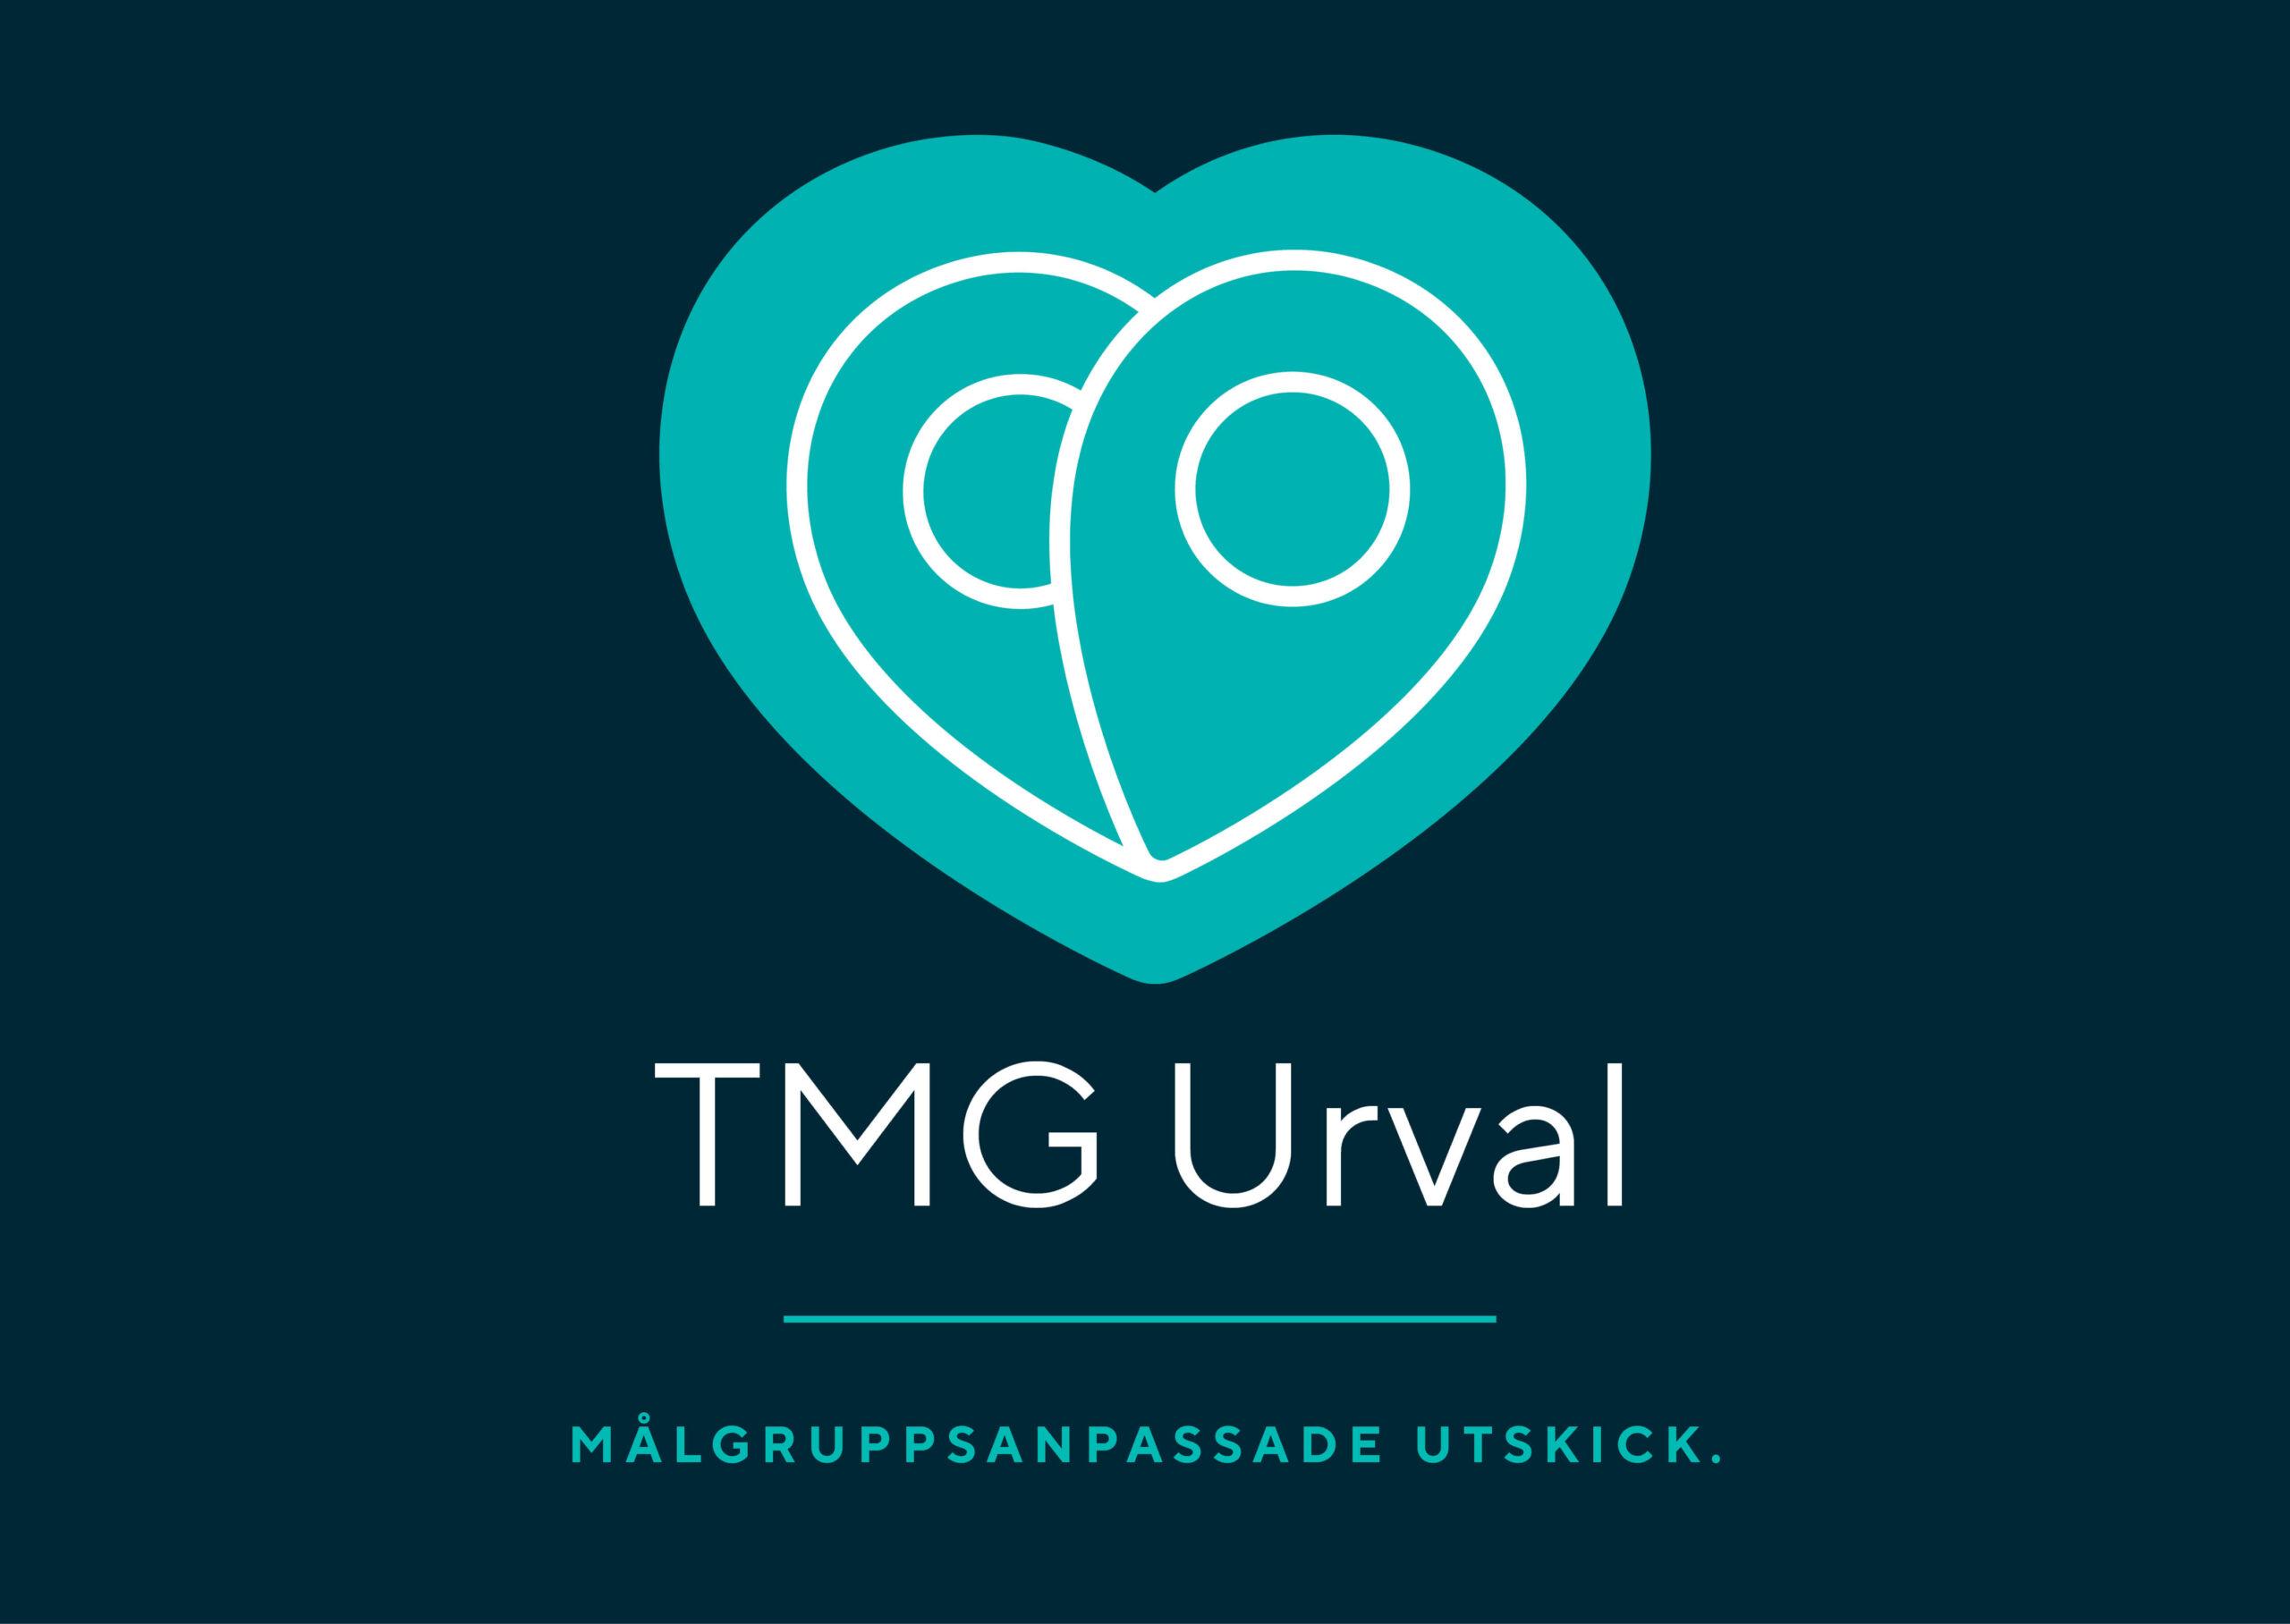 TMG Urval